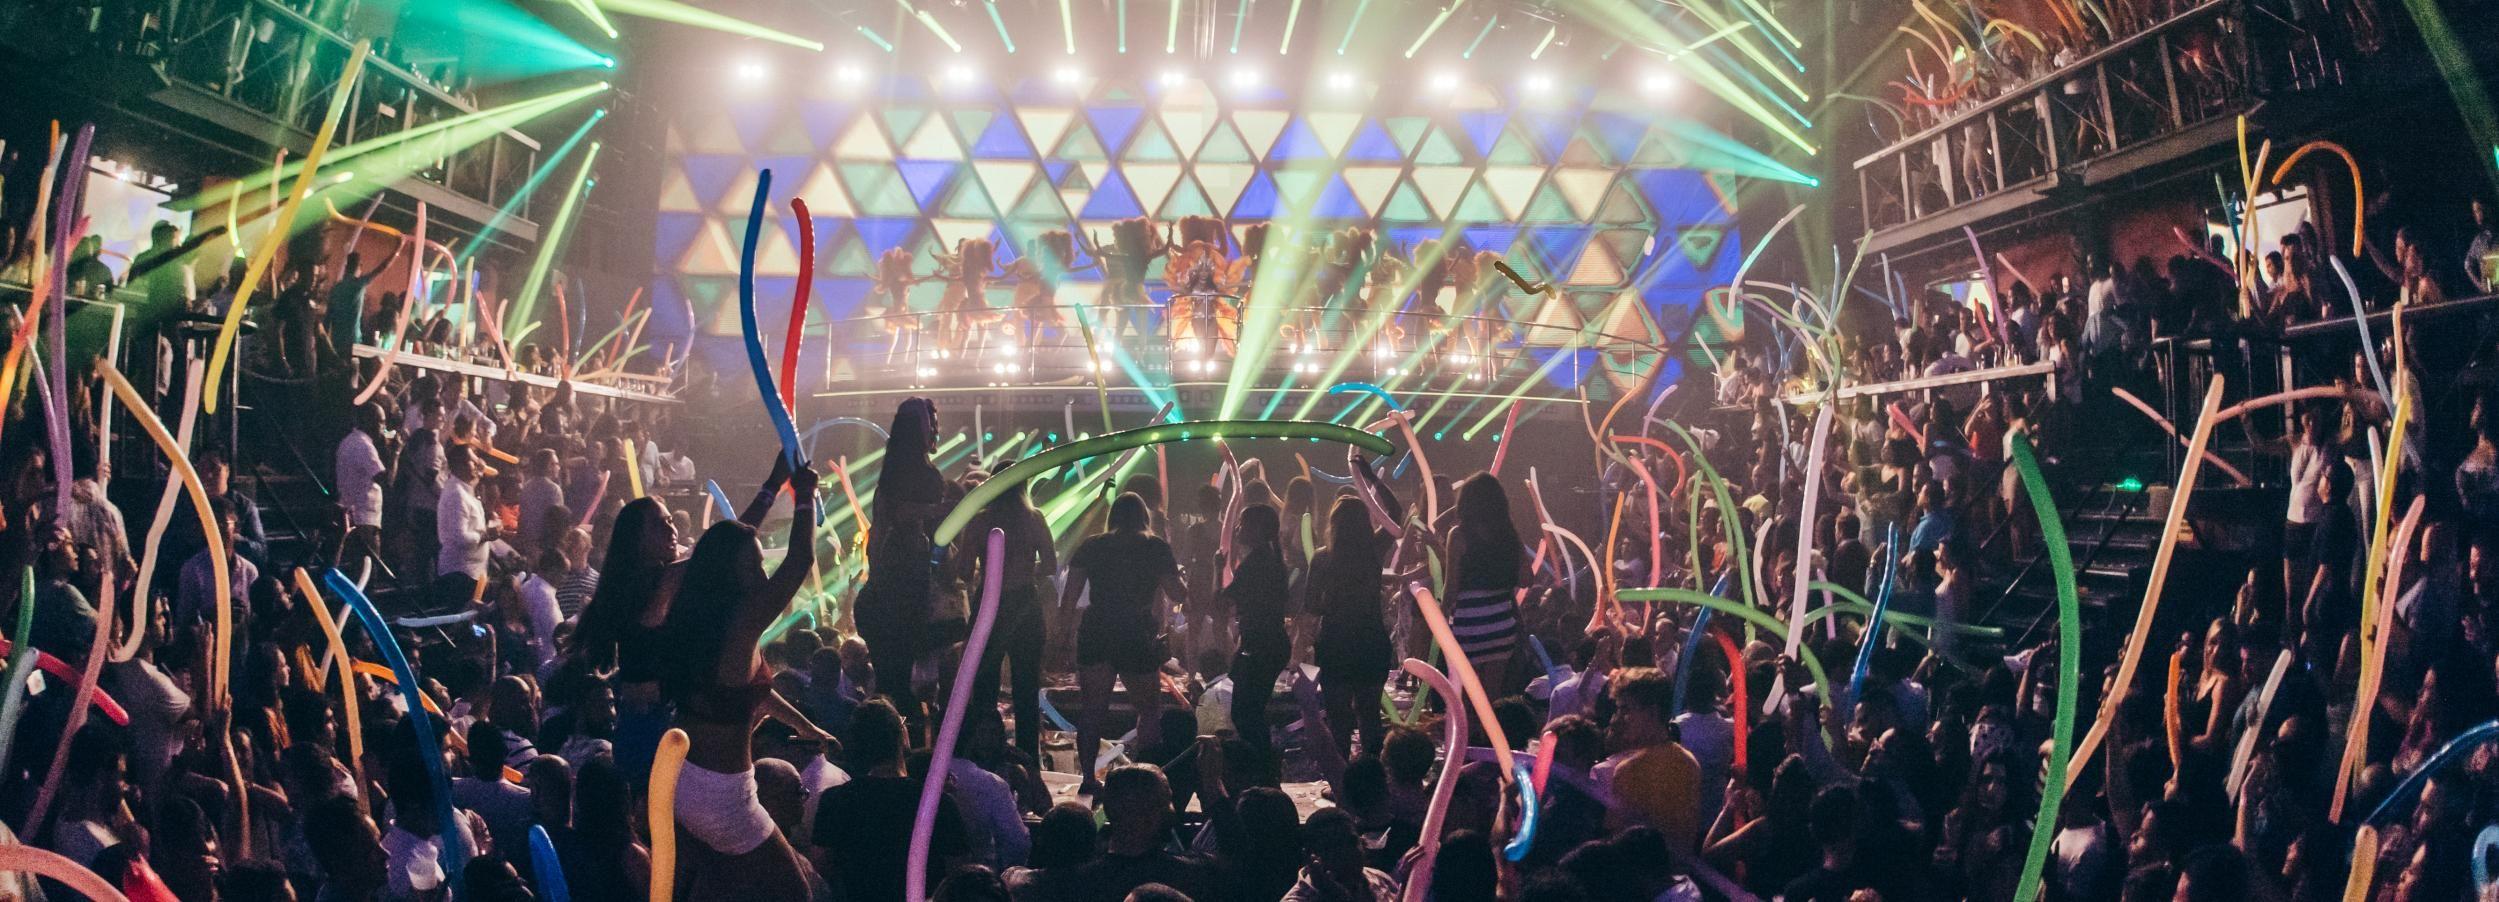 Punta Cana: Coco Bongo Nightclub Experience with Transfer